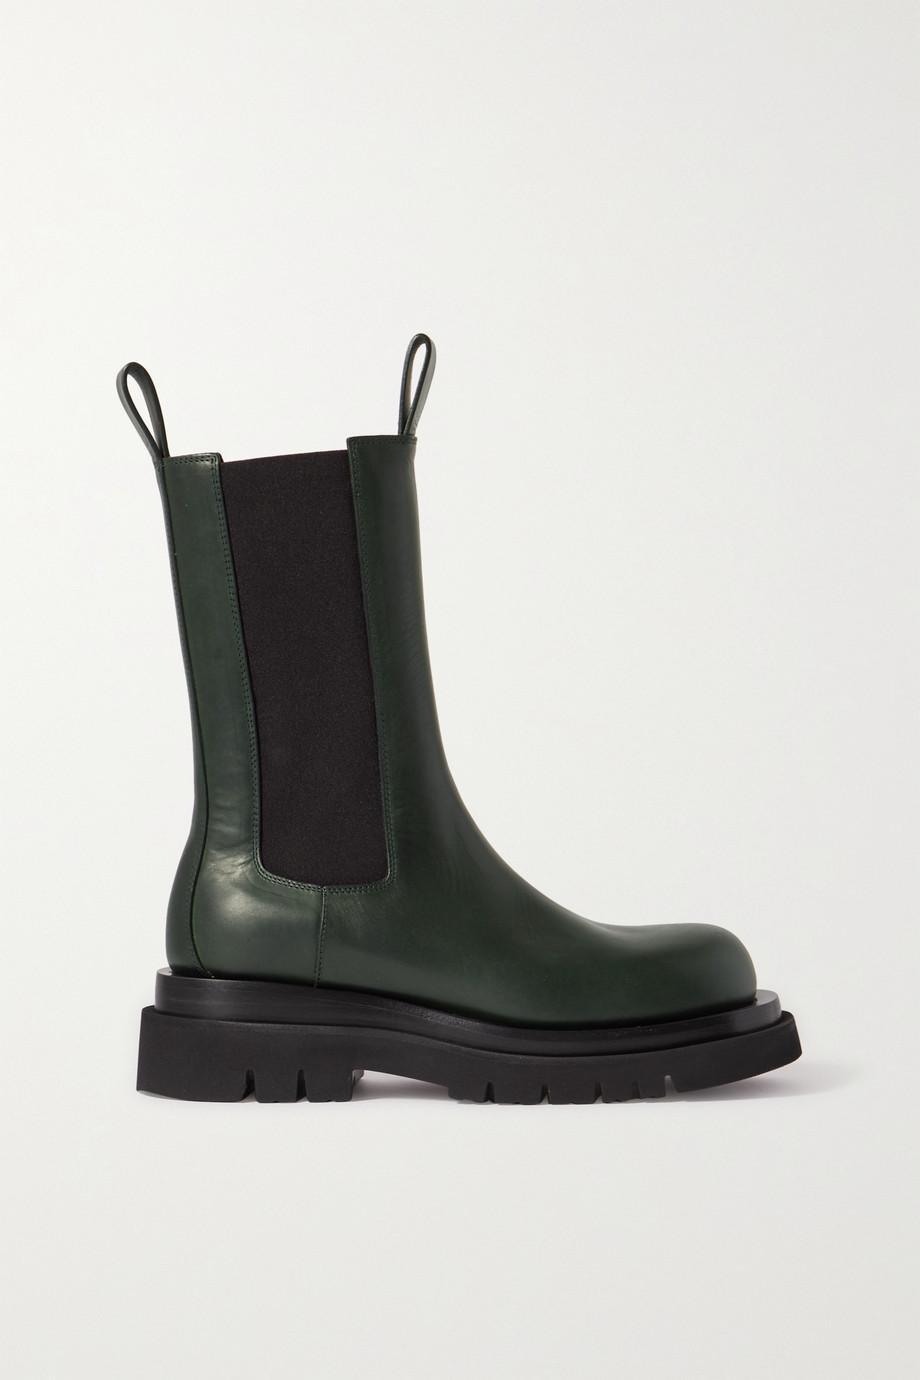 Bottega Veneta Lug rubber-trimmed leather Chelsea boots